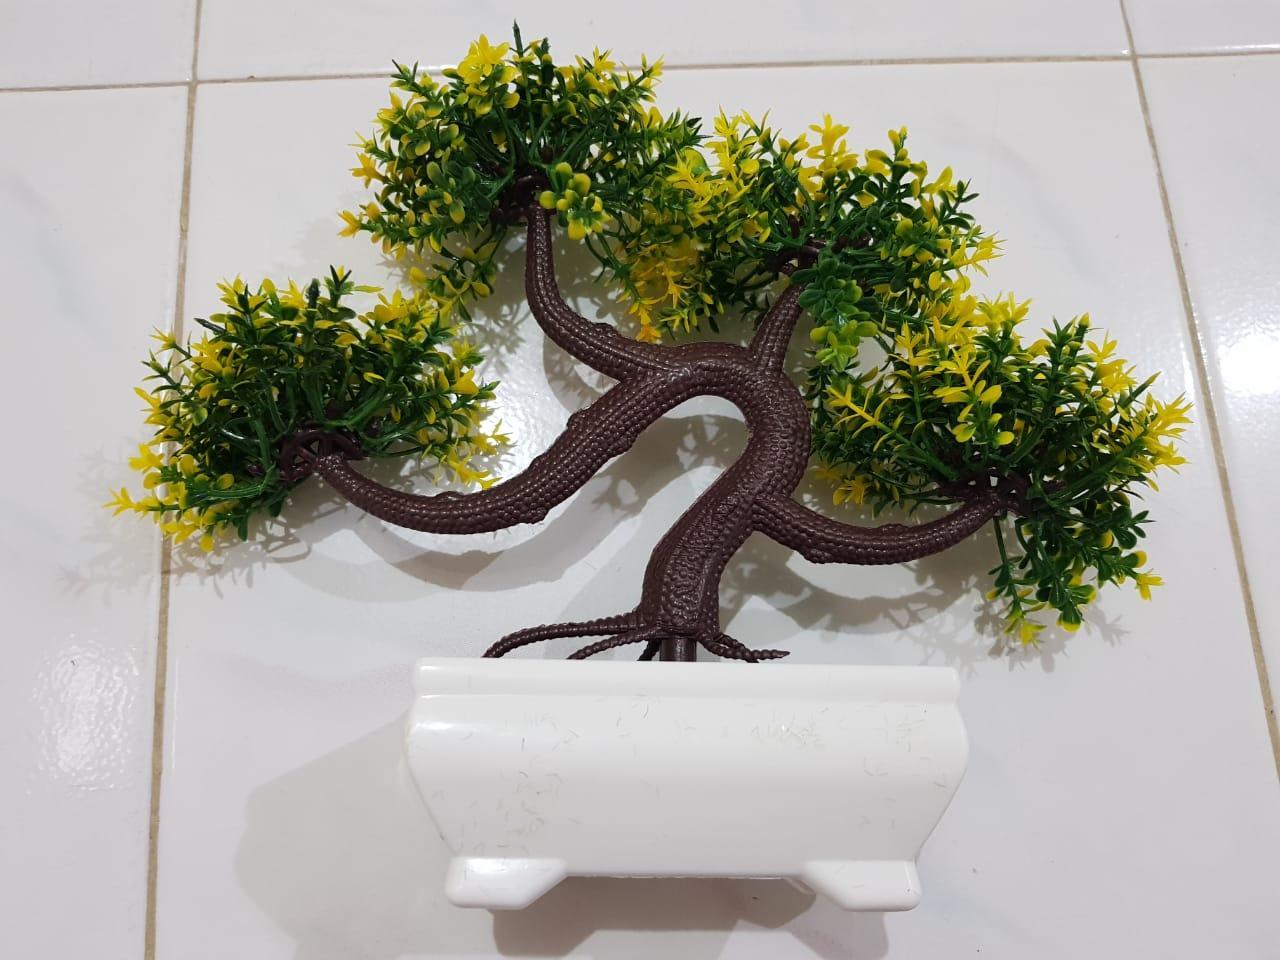 BONSAI Meja Bonsai Plastik Bonsai Artifisial pohon Bonsai - Dikit Kuning 50defa44e5